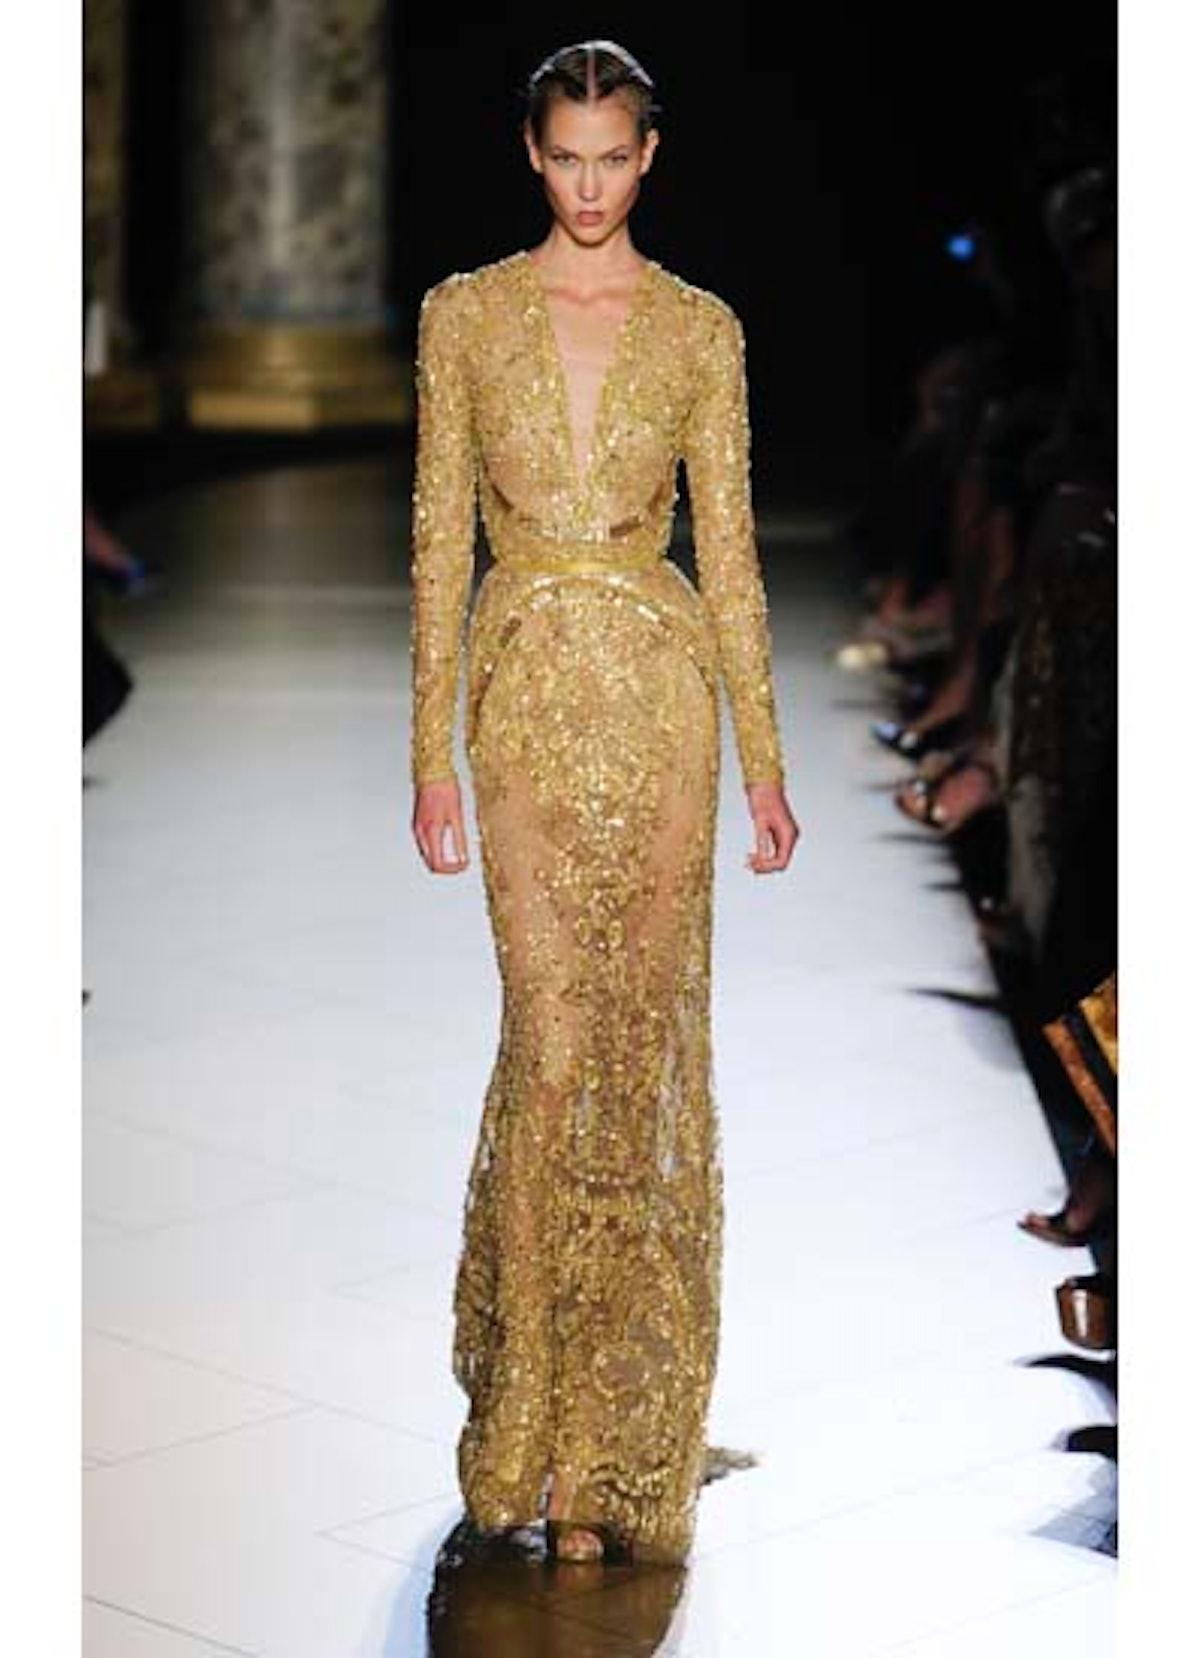 fass-elie-saab-couture-2012-runway-45-v.jpg